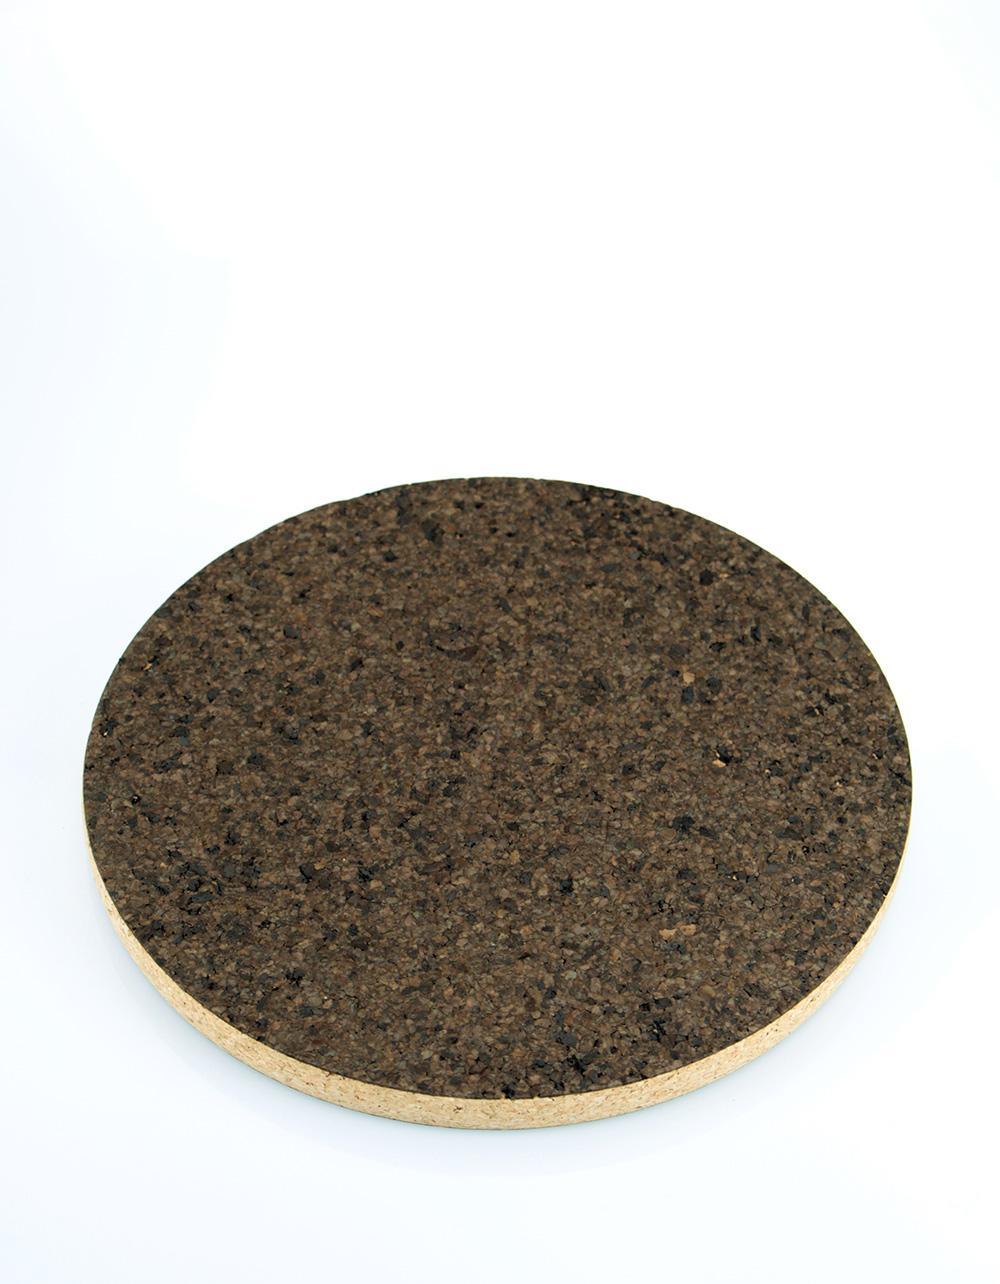 The Essential Ingredient Round Cork Mat 'Burnt' 25cm x 2cm